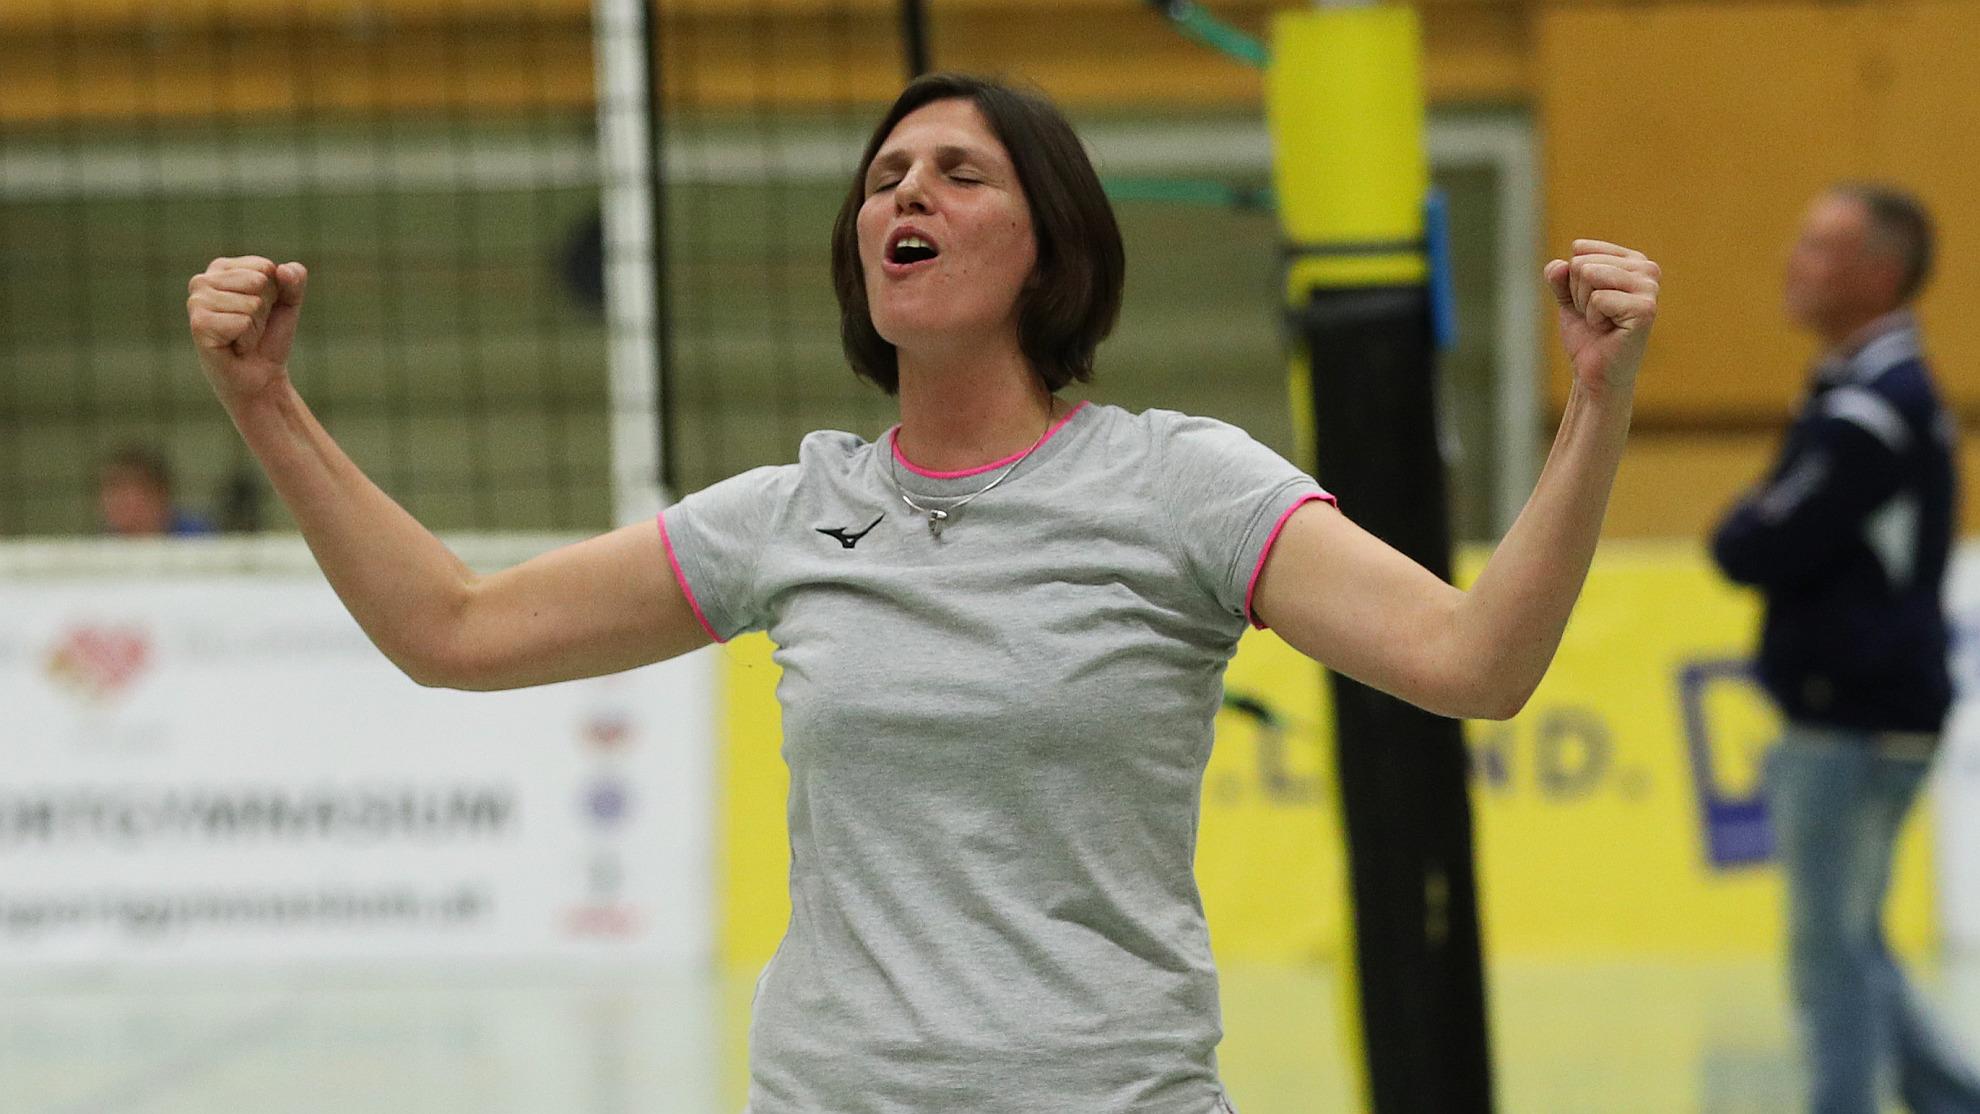 SG VB NÖ Sokol Post-Trainerin Zuzana Pecha-Tlstovicova 2019 - Foto © GEPA pictures/Christian Ort